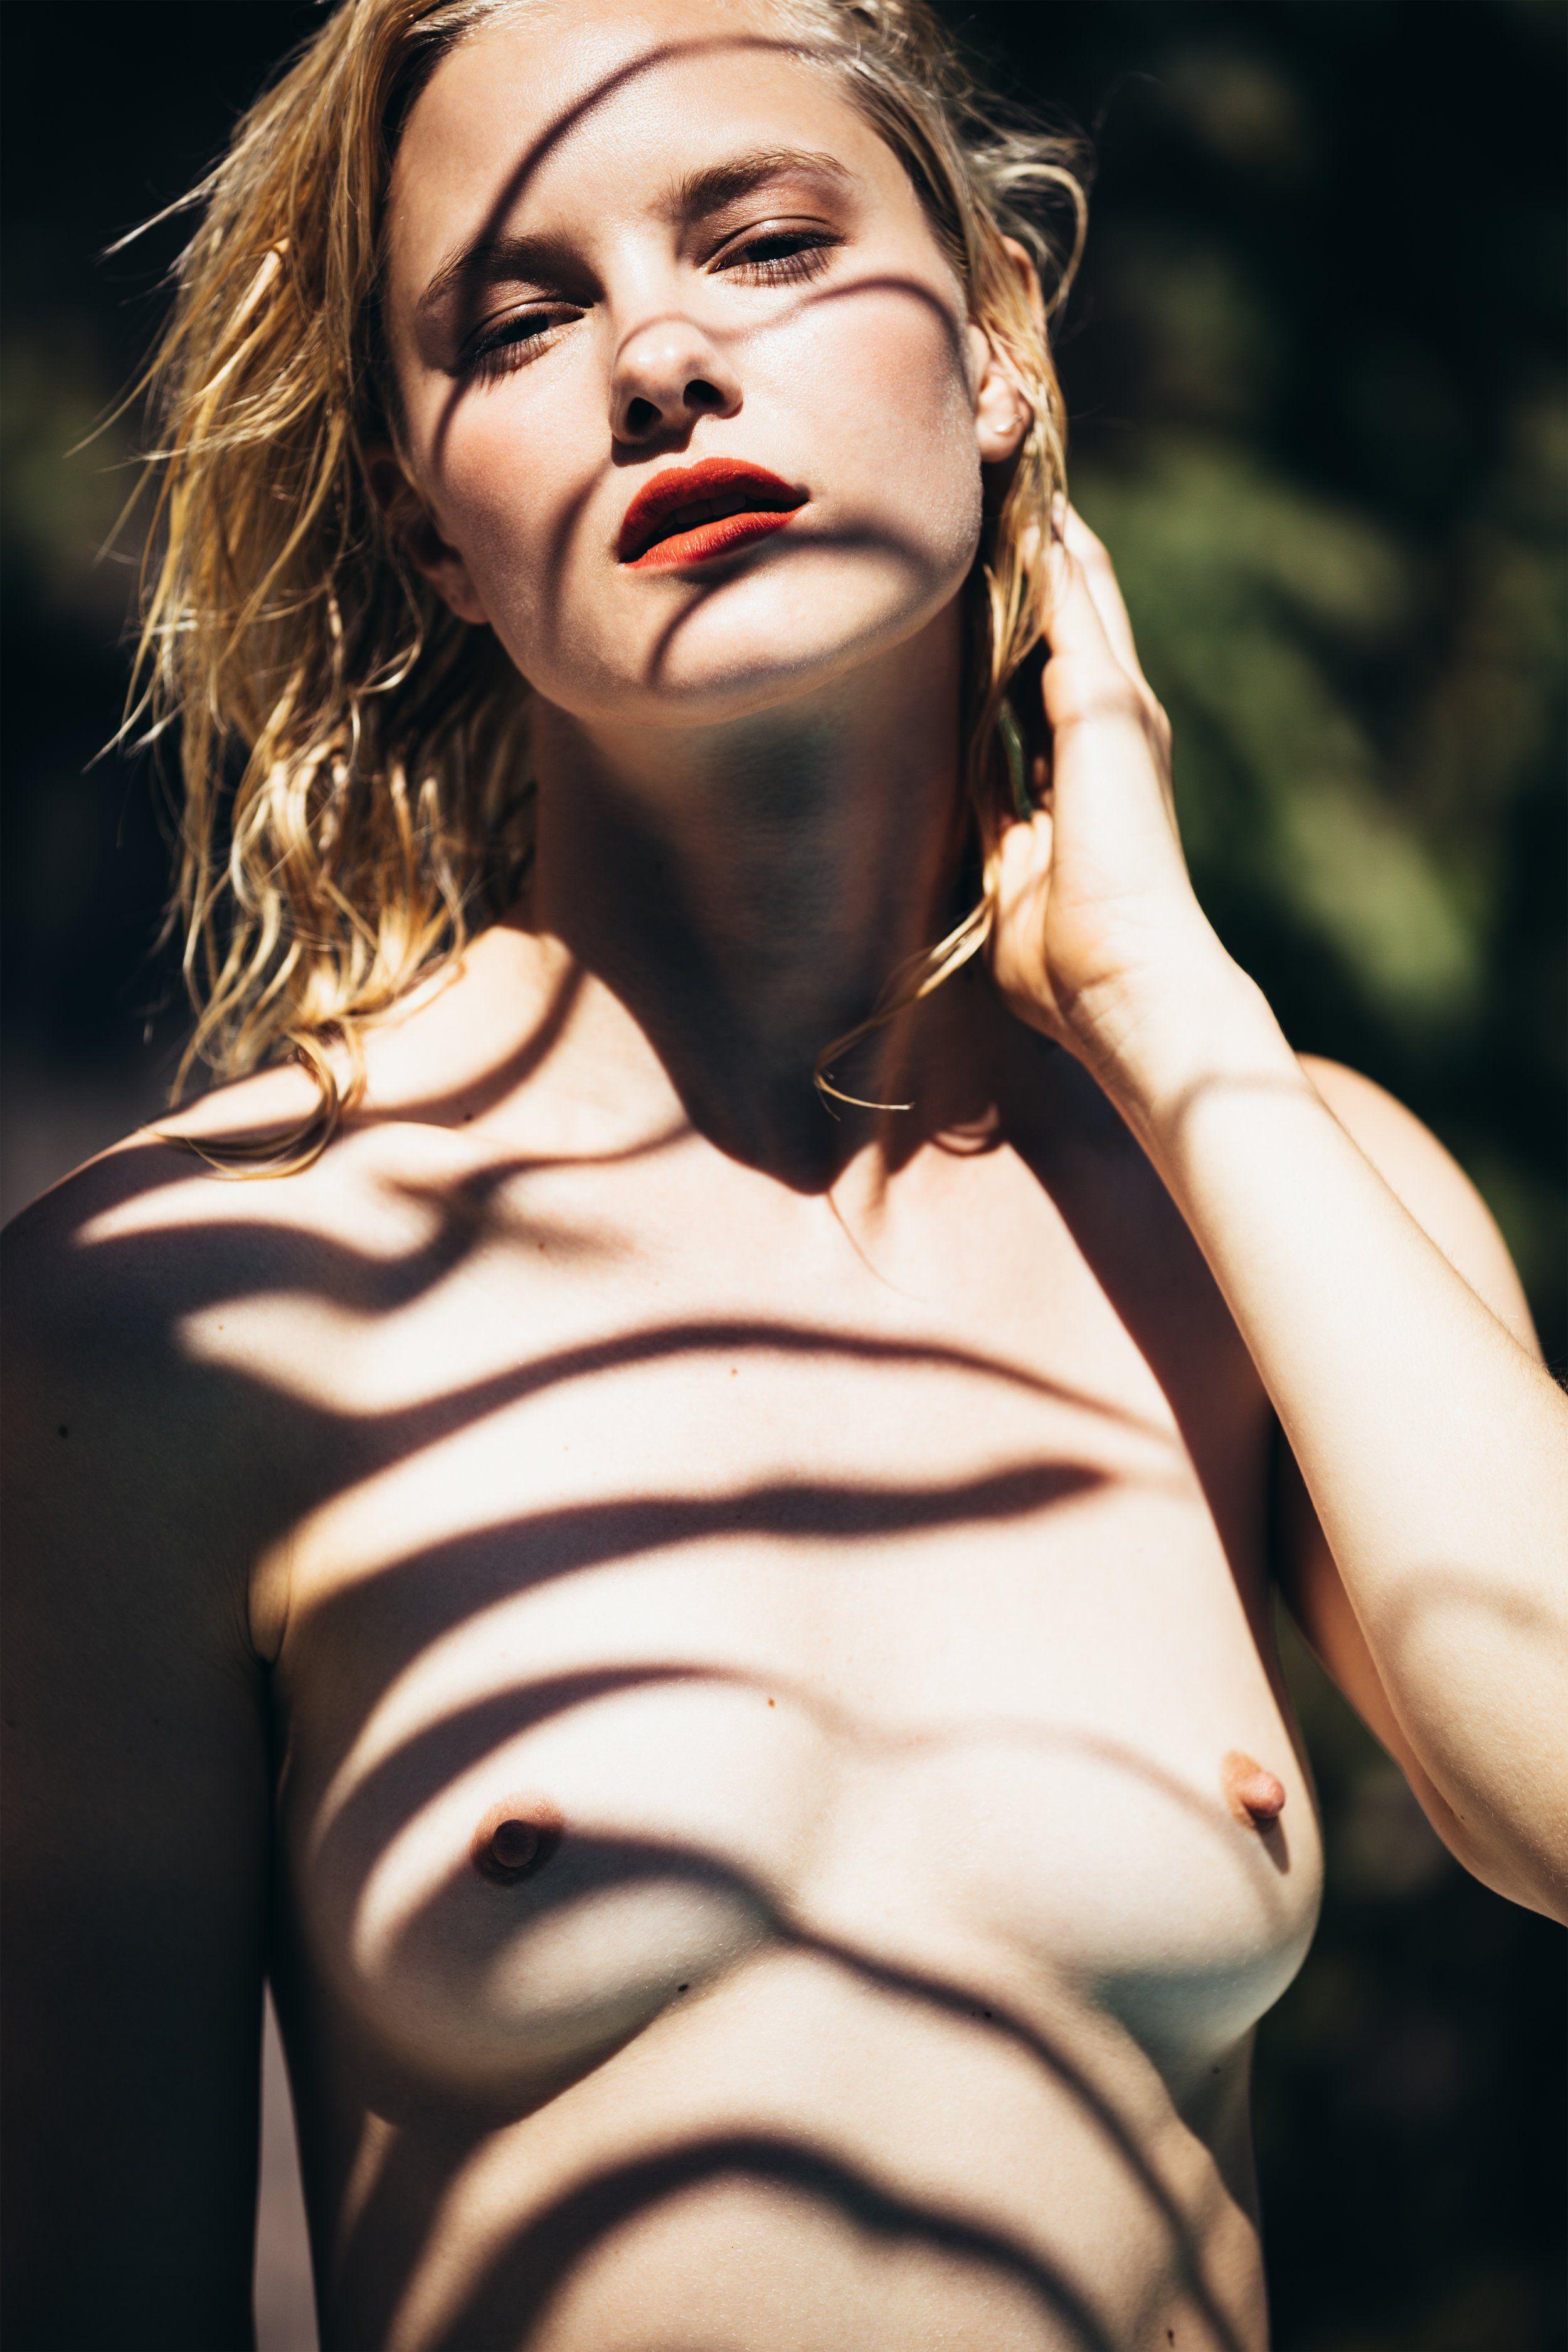 Hannah holman by aaron feaver hq photo shoot naked (88 photo), Boobs Celebrity photo